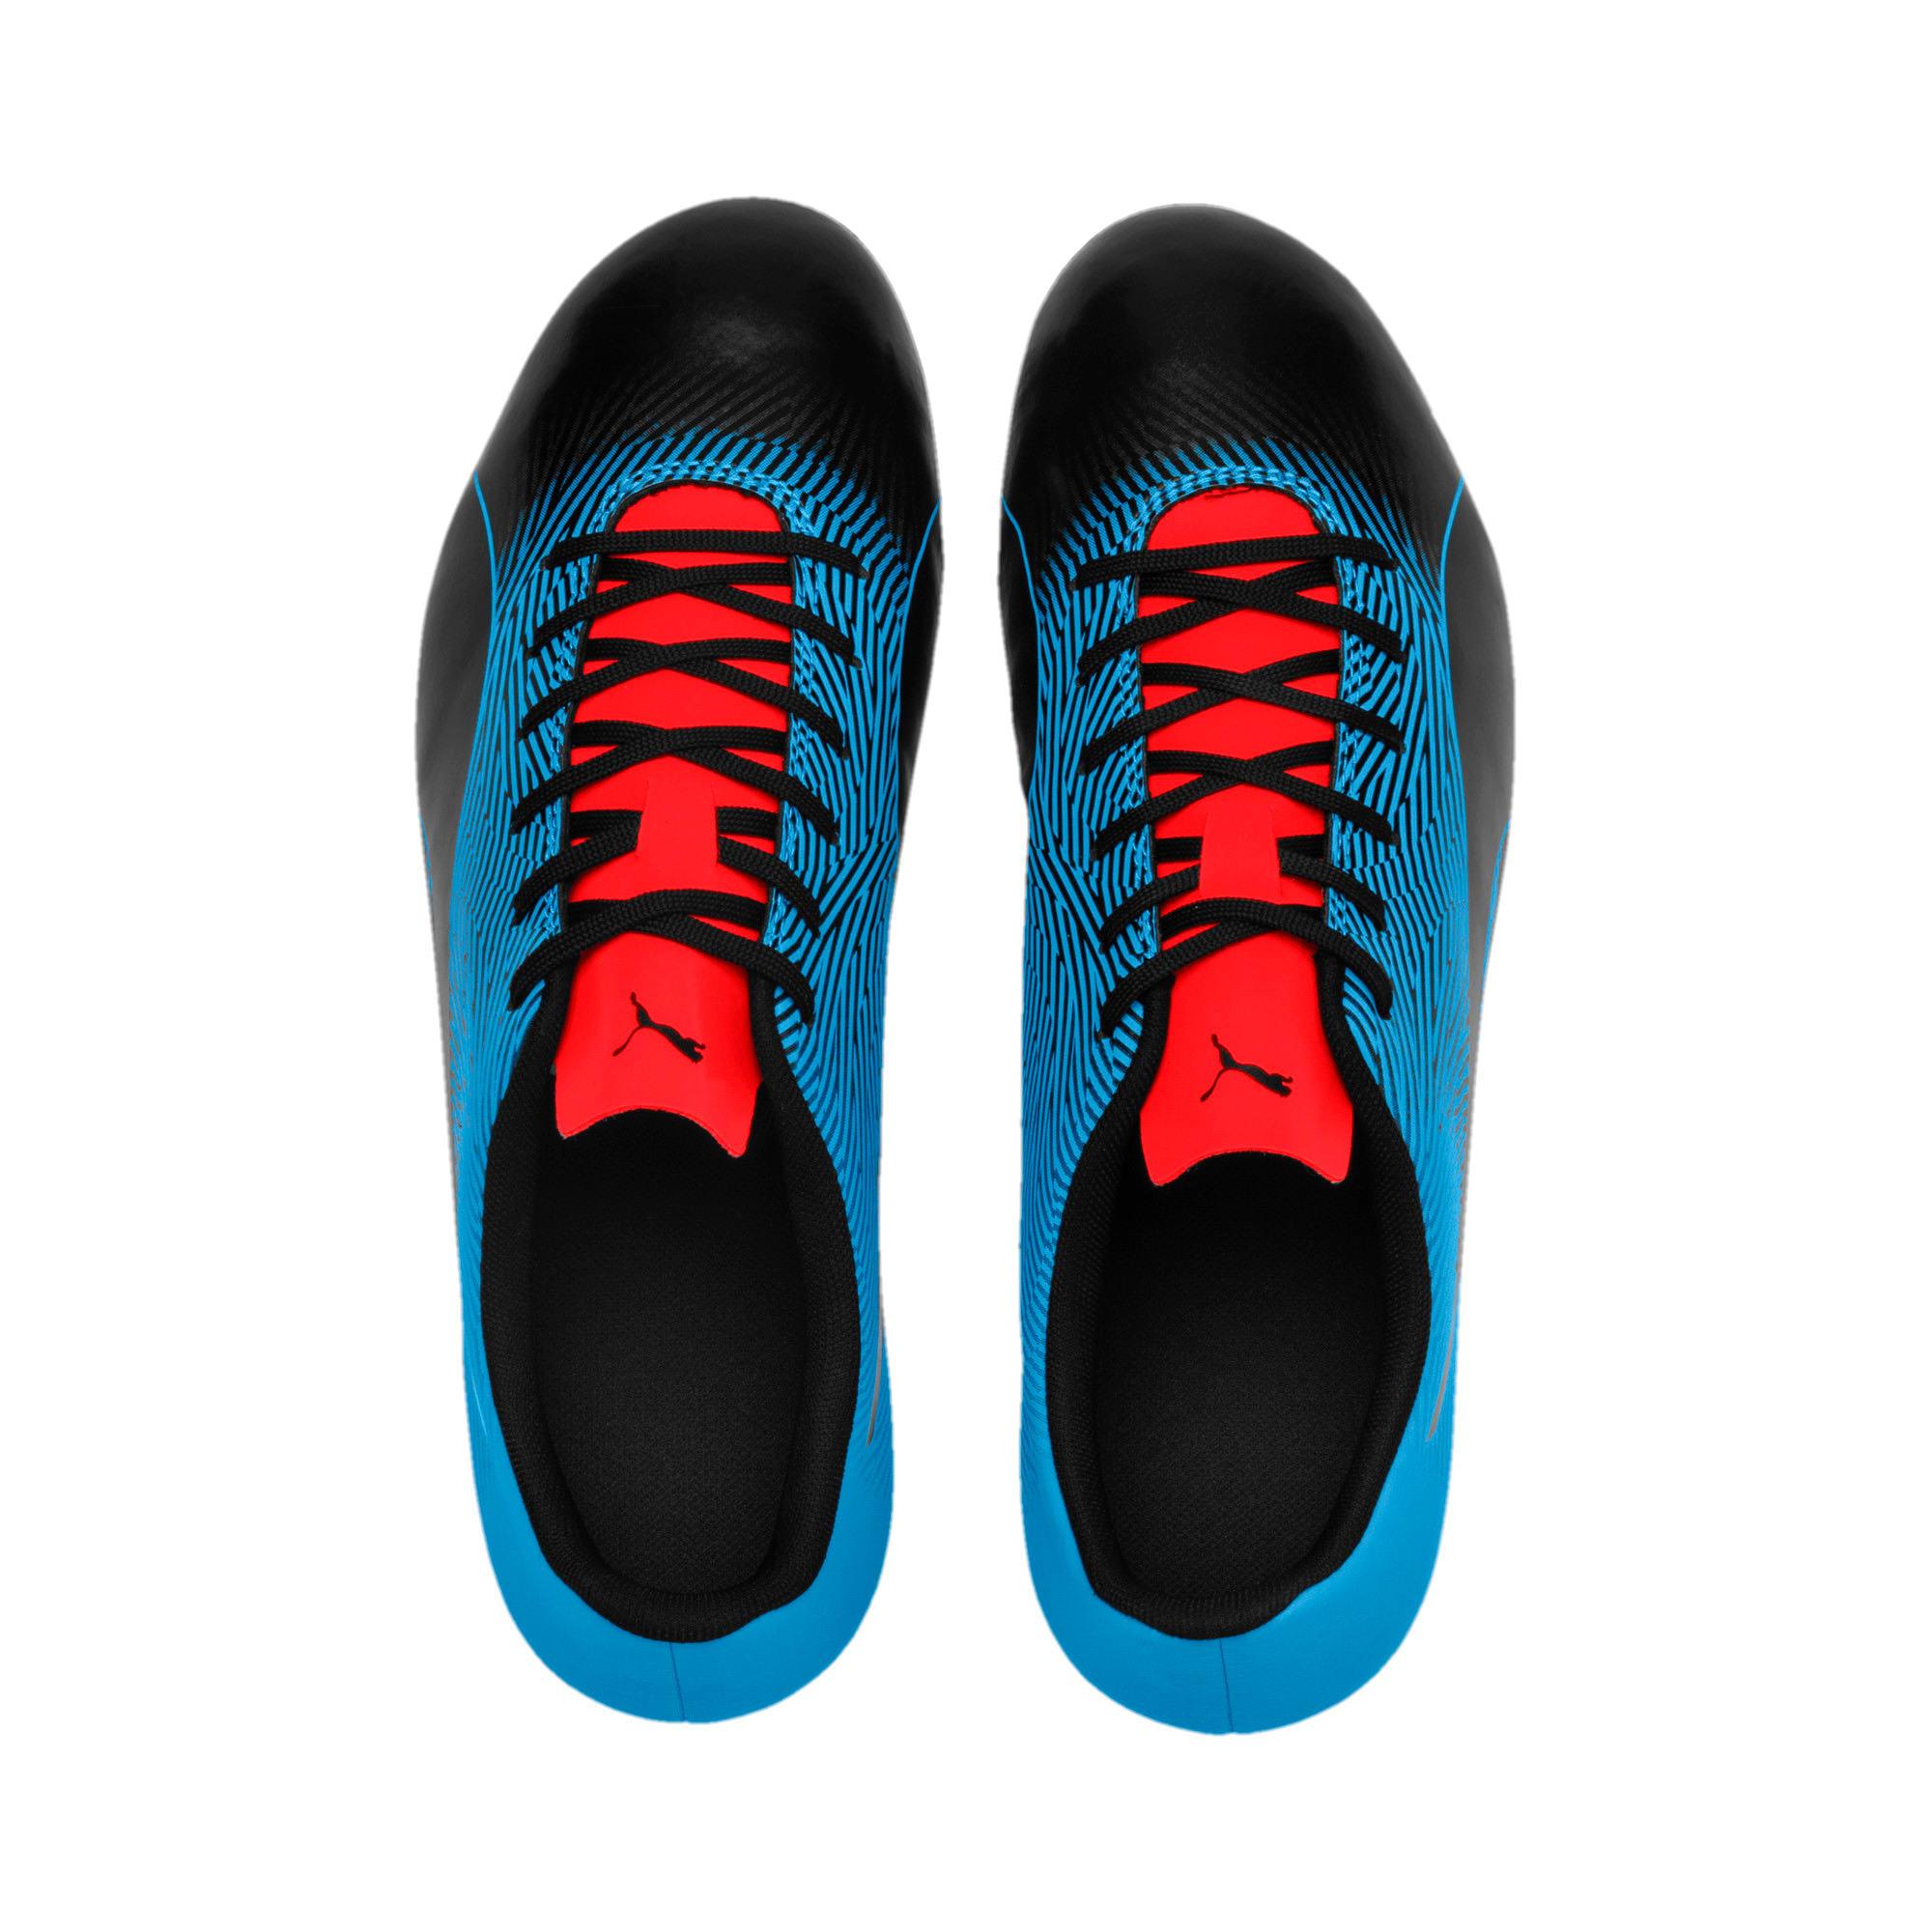 Miniatura 6 de Botines de fútbol PUMA Spirit II FG para hombre, Black-Bleu Azur-Red Blast, mediano